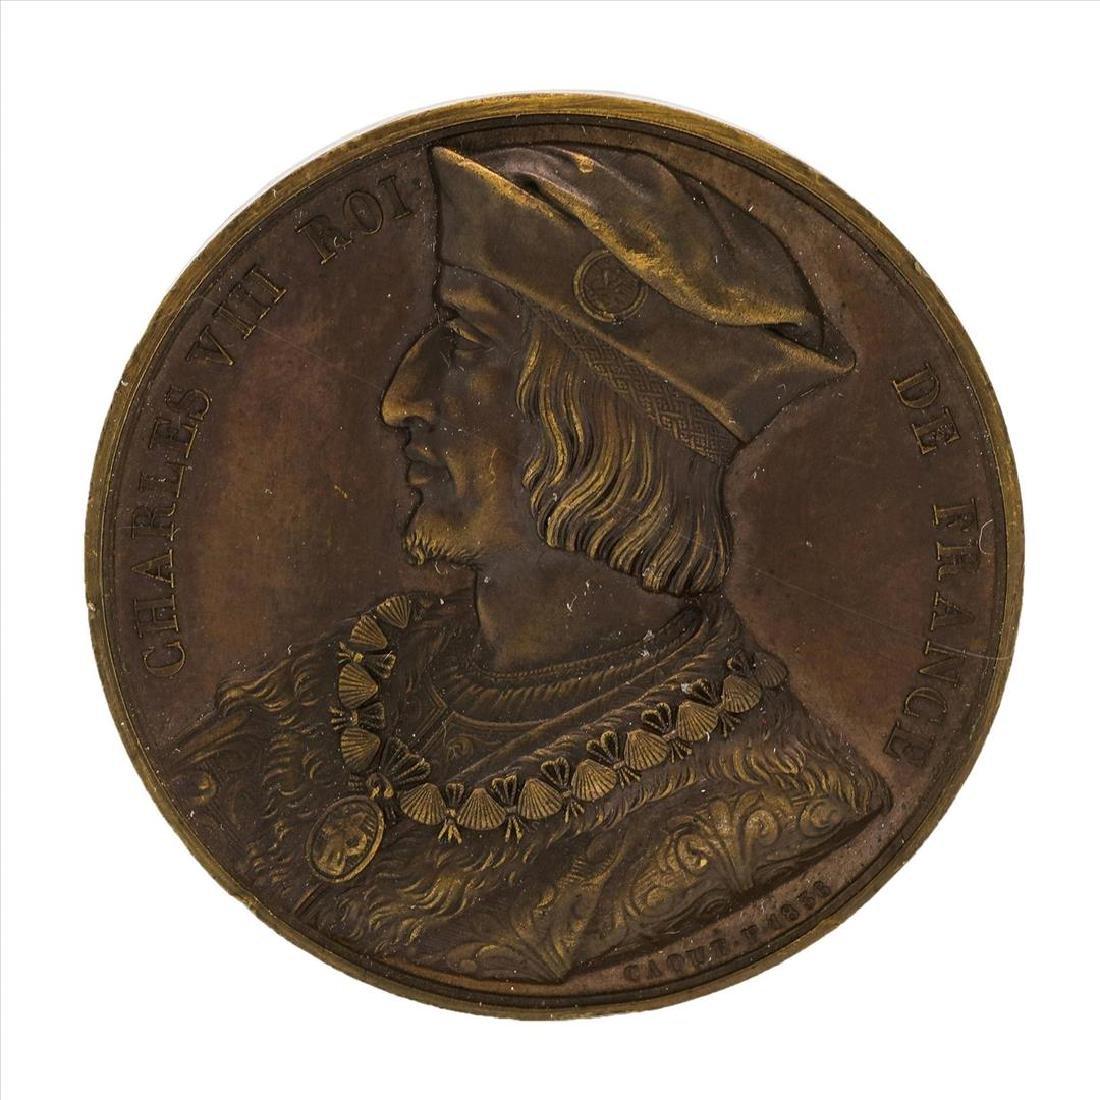 1498 France Charles VIII Medal